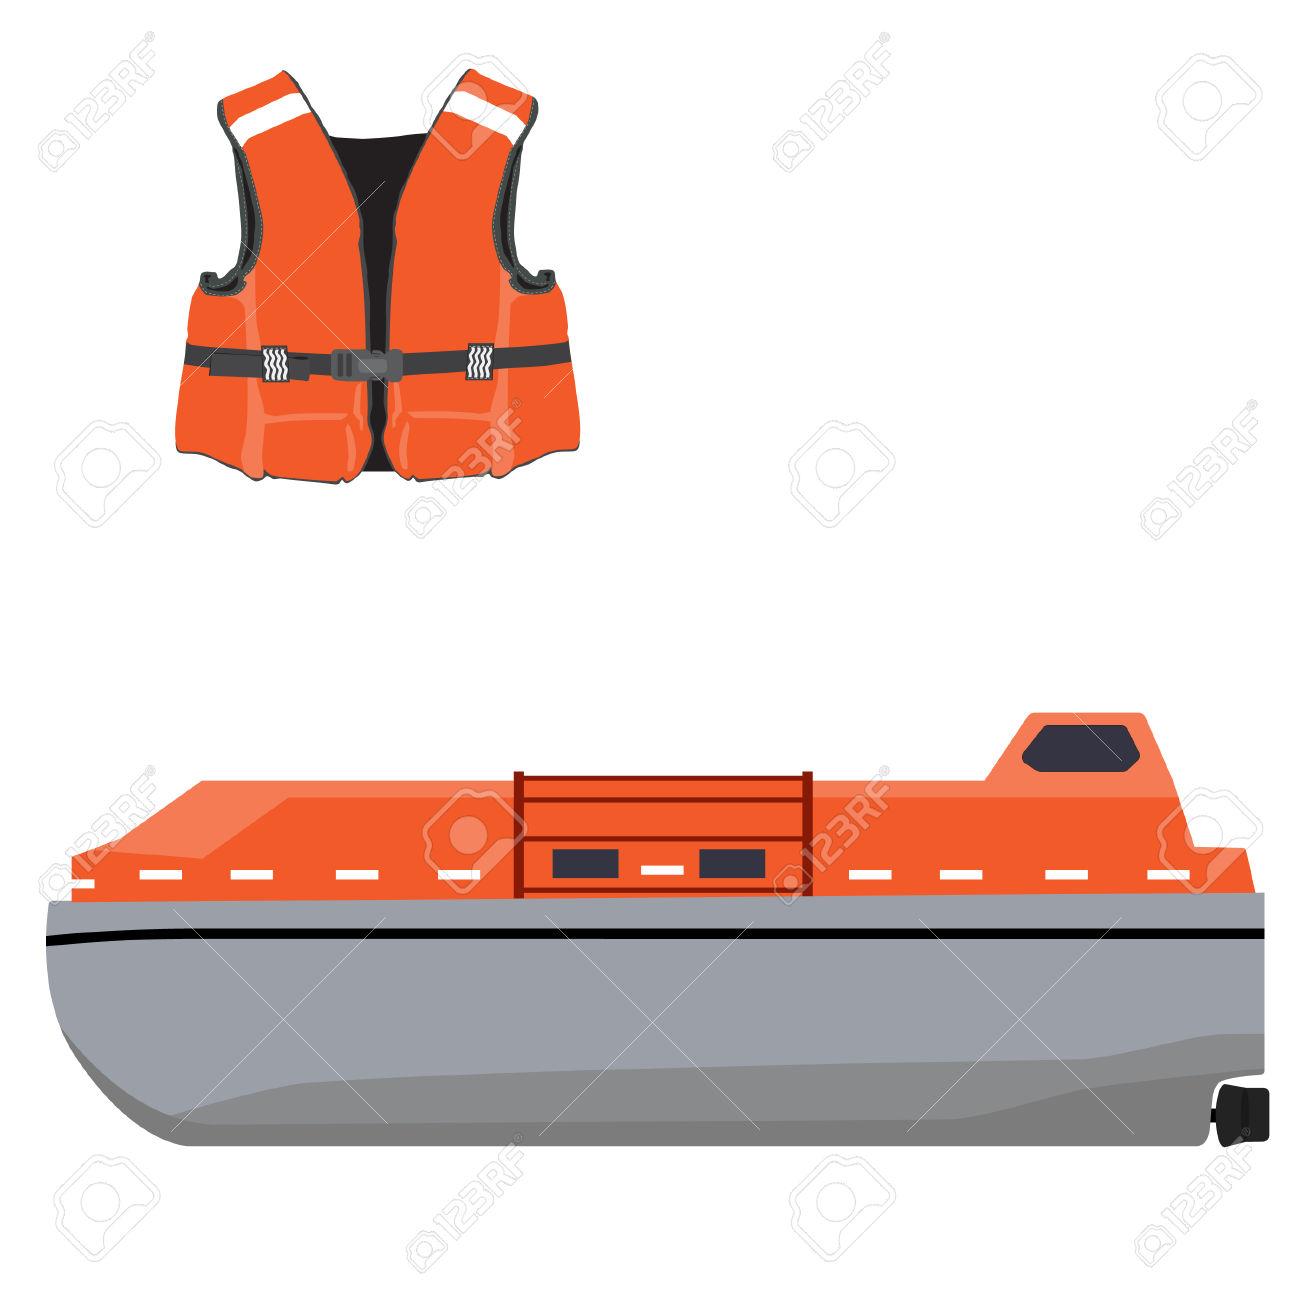 Vector Illustration Of Orange Life Boat And Life Jacket. Life.